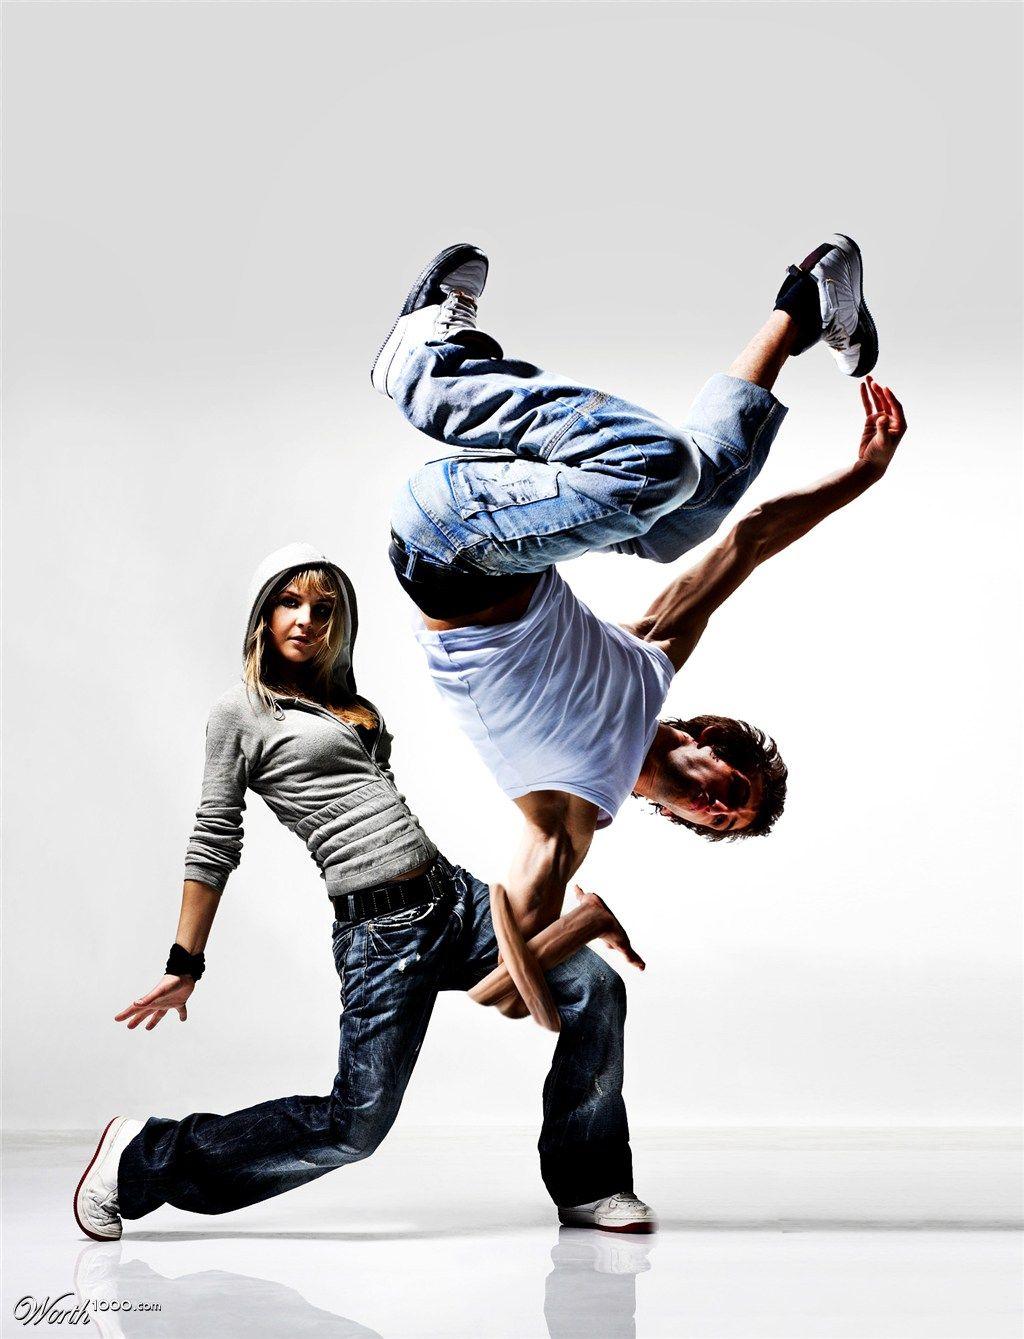 hip hop dance clipart panda free clipart images hip hop dance clipart panda free clipart images voltagebd Choice Image